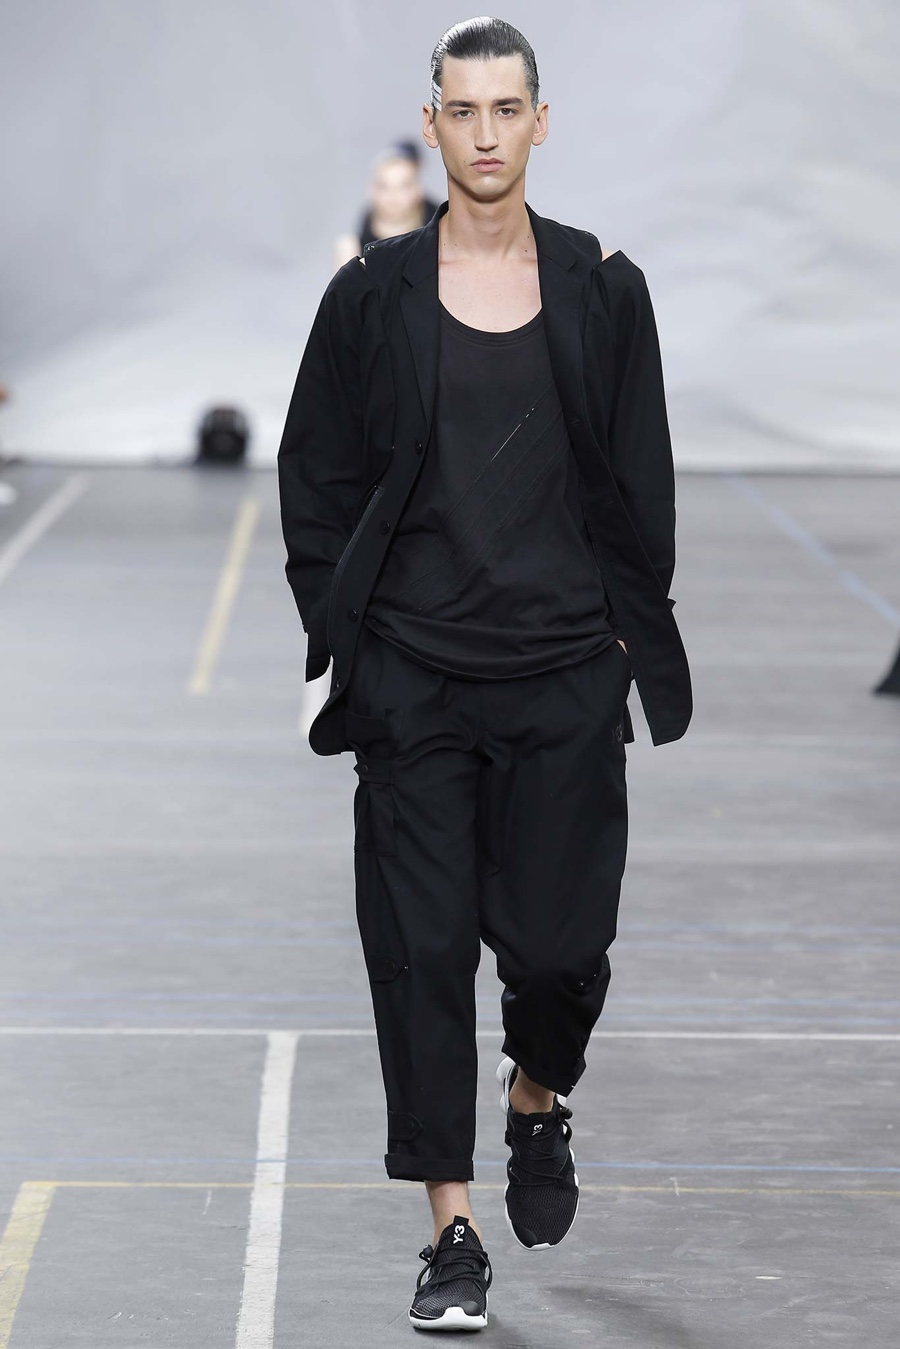 Y-3 Spring/Summer 2016 Menswear Collection | Paris Fashion Week